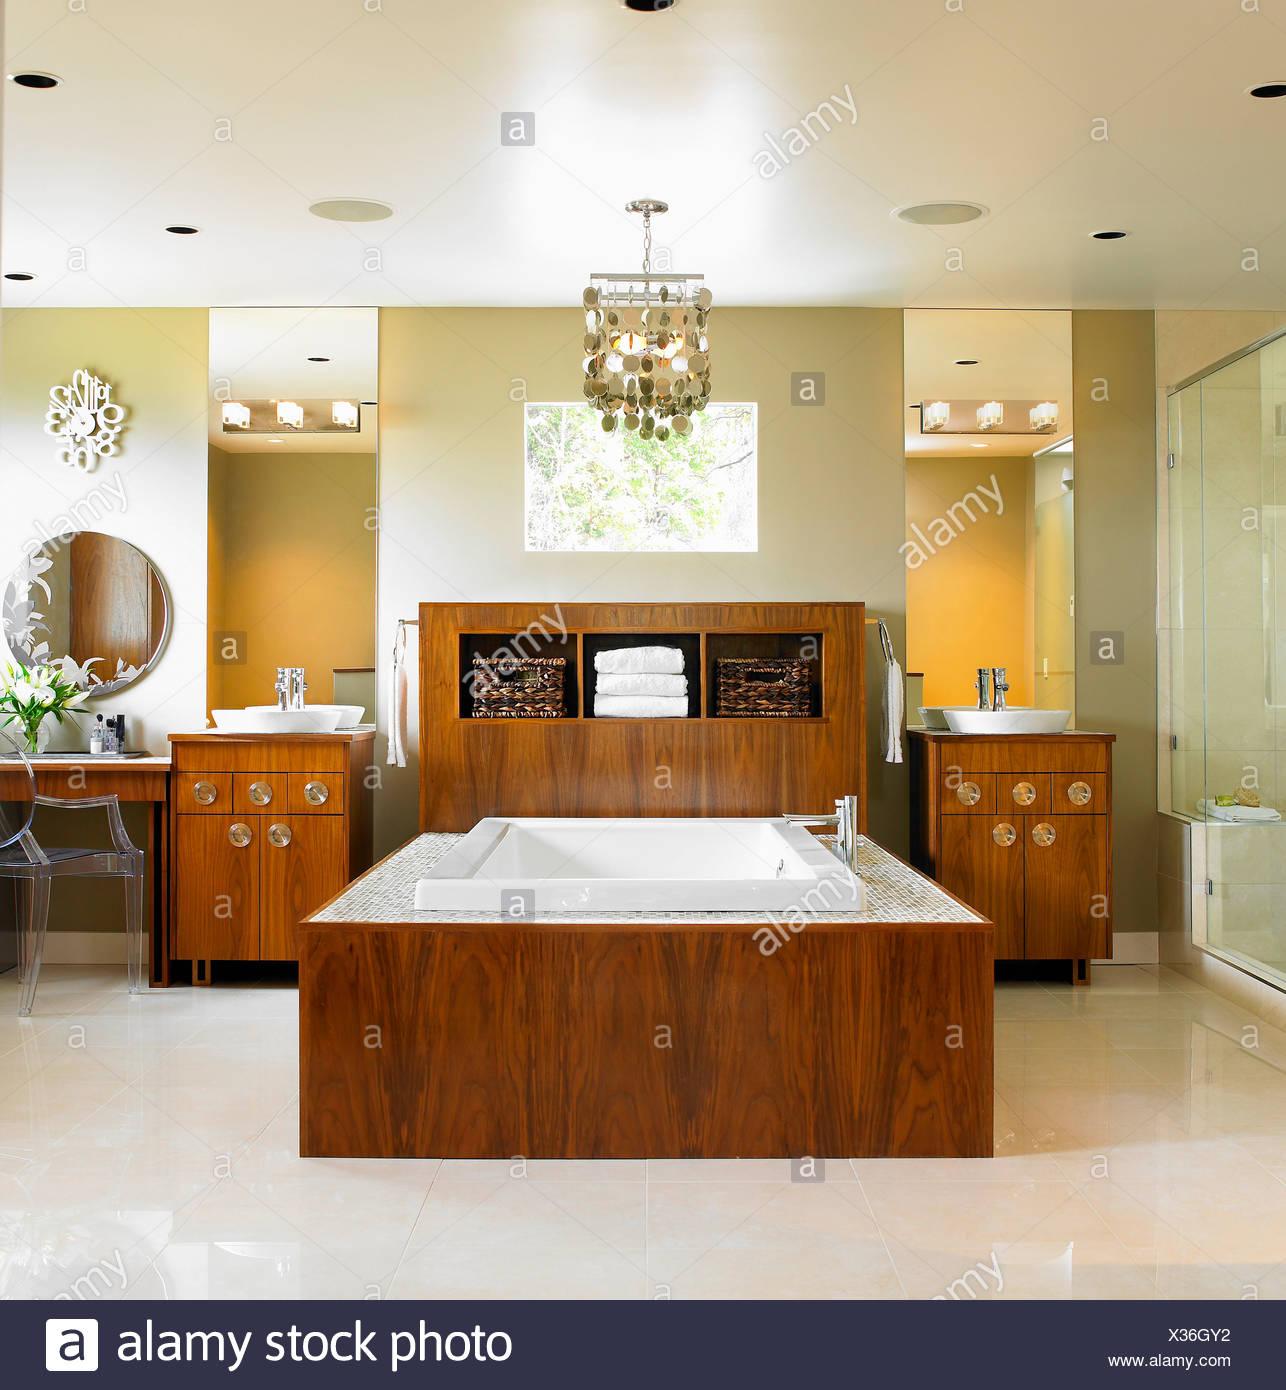 Neutral modern bathroom featuring bathtub with wood surround victoria vancouver island british columbia canada